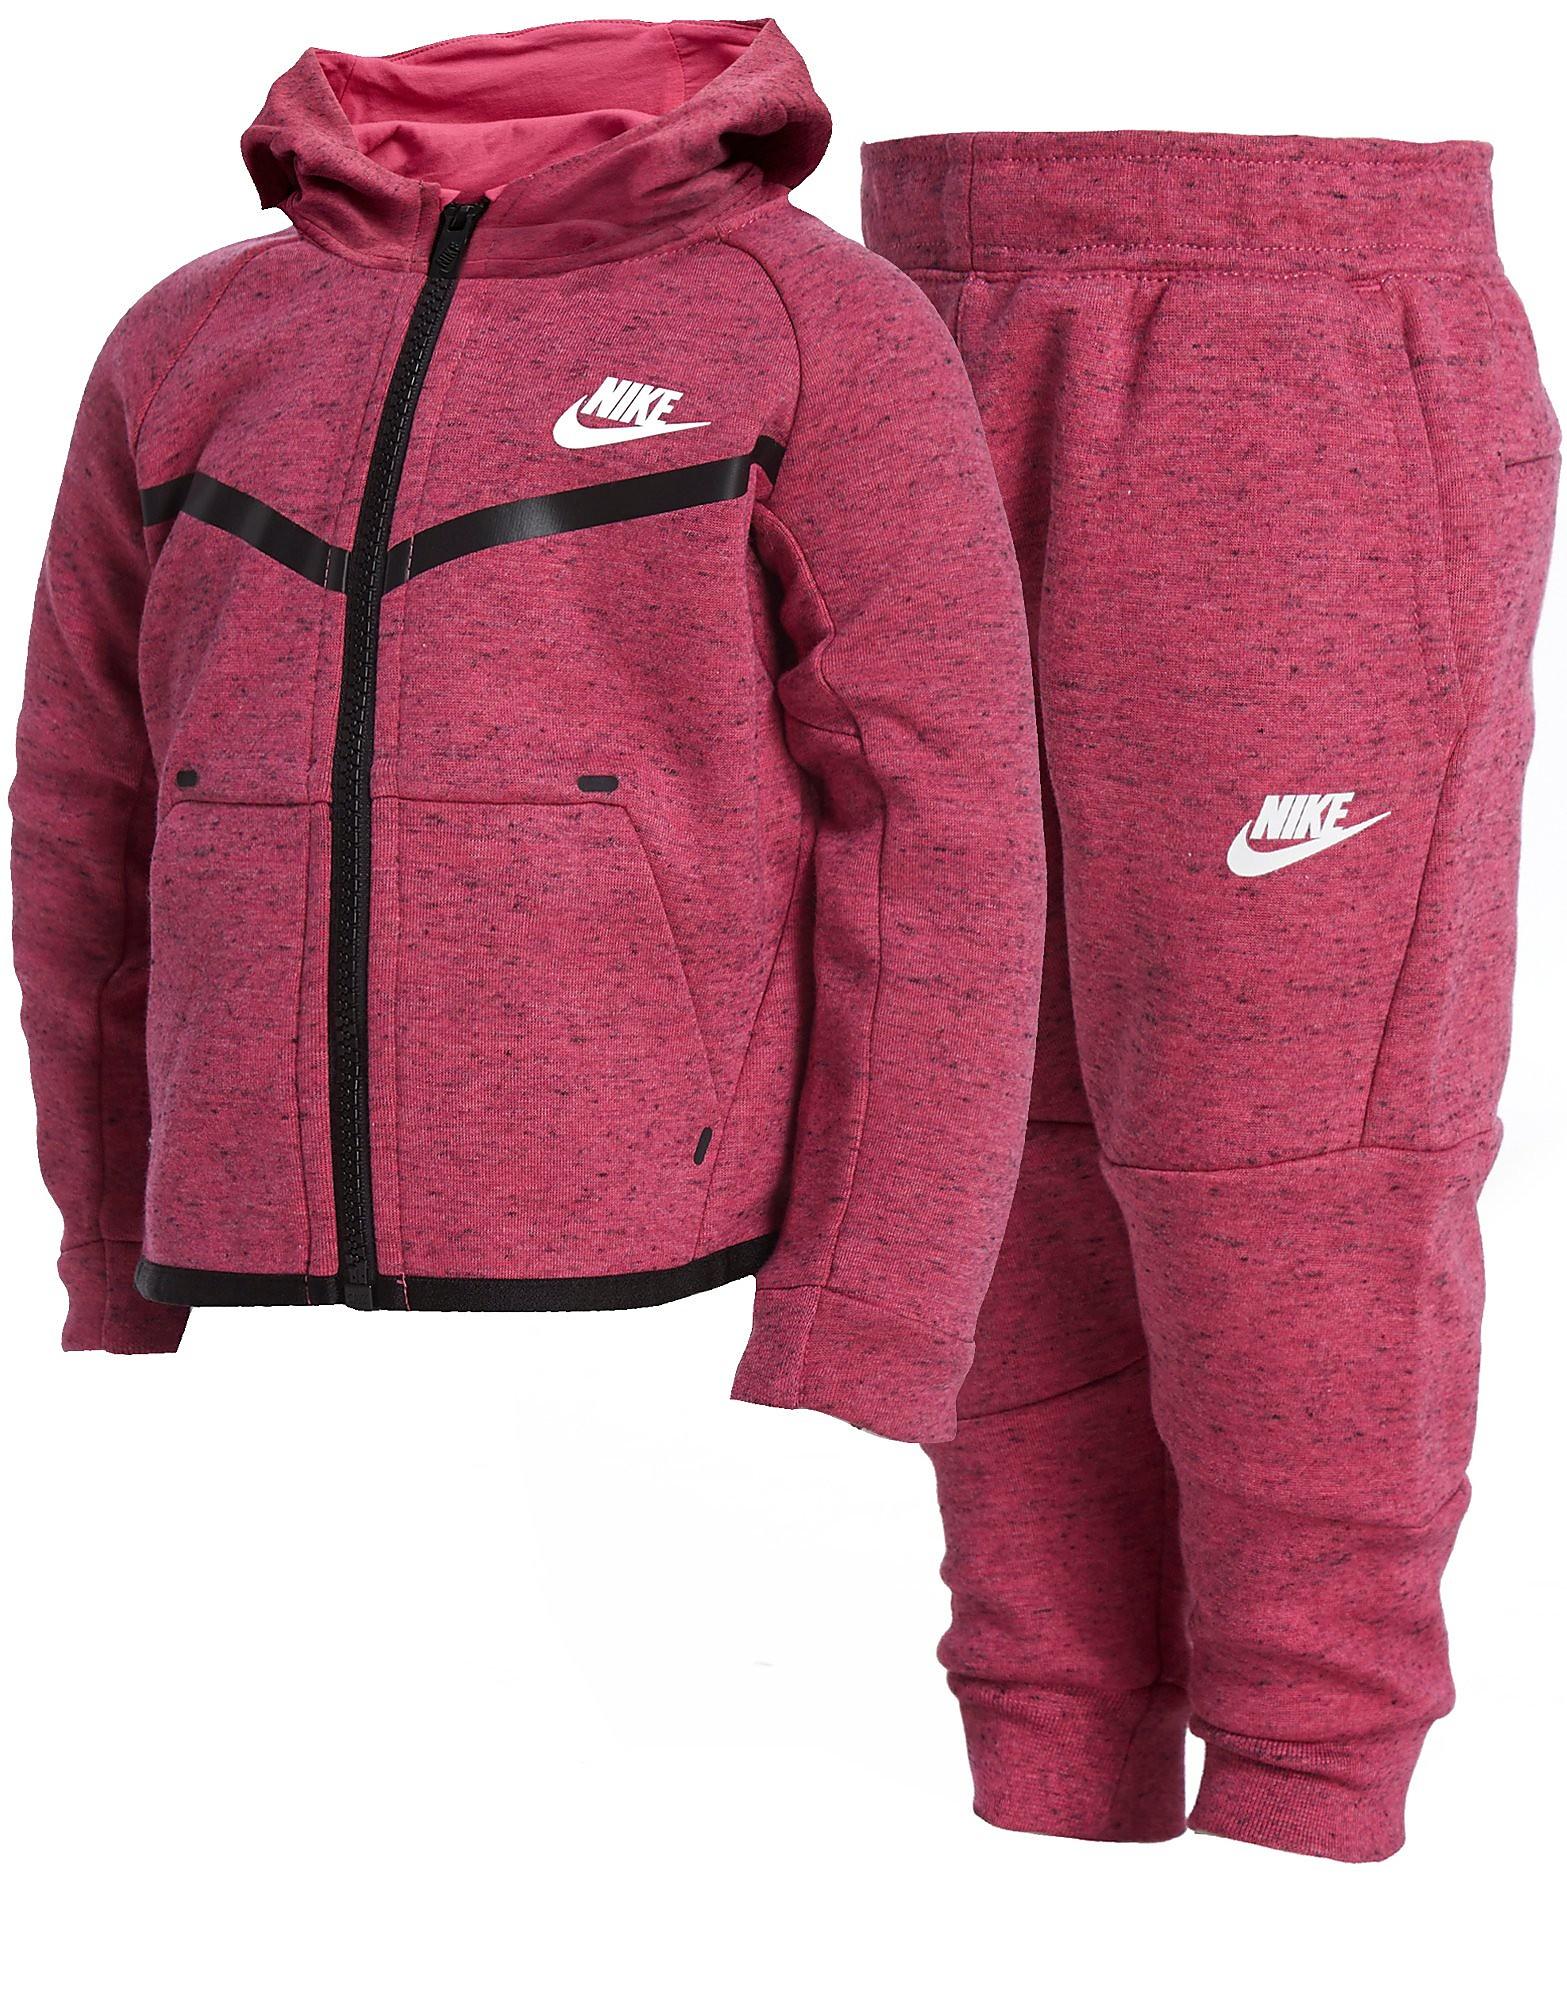 Nike Tech Fleece-Trainingsanzug für Mädchen